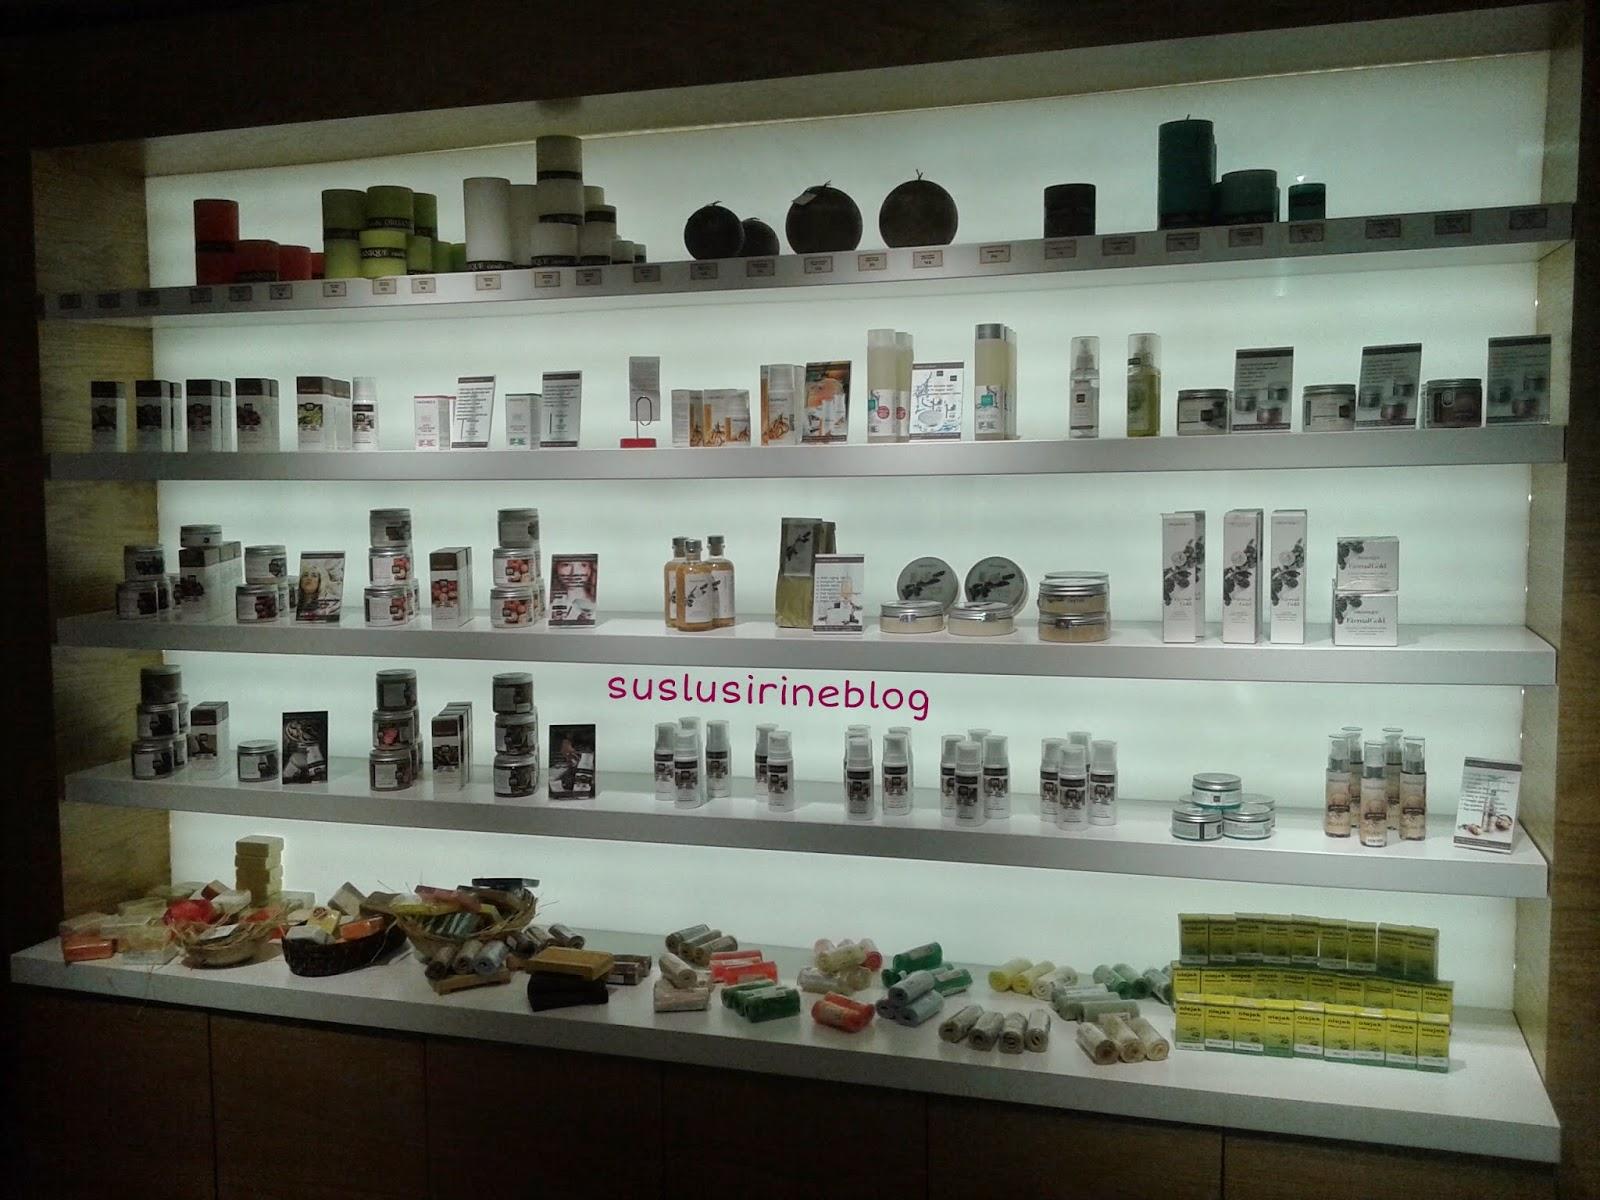 Organique Antalya cilt bakimi,sac bakimi,spa urunleri